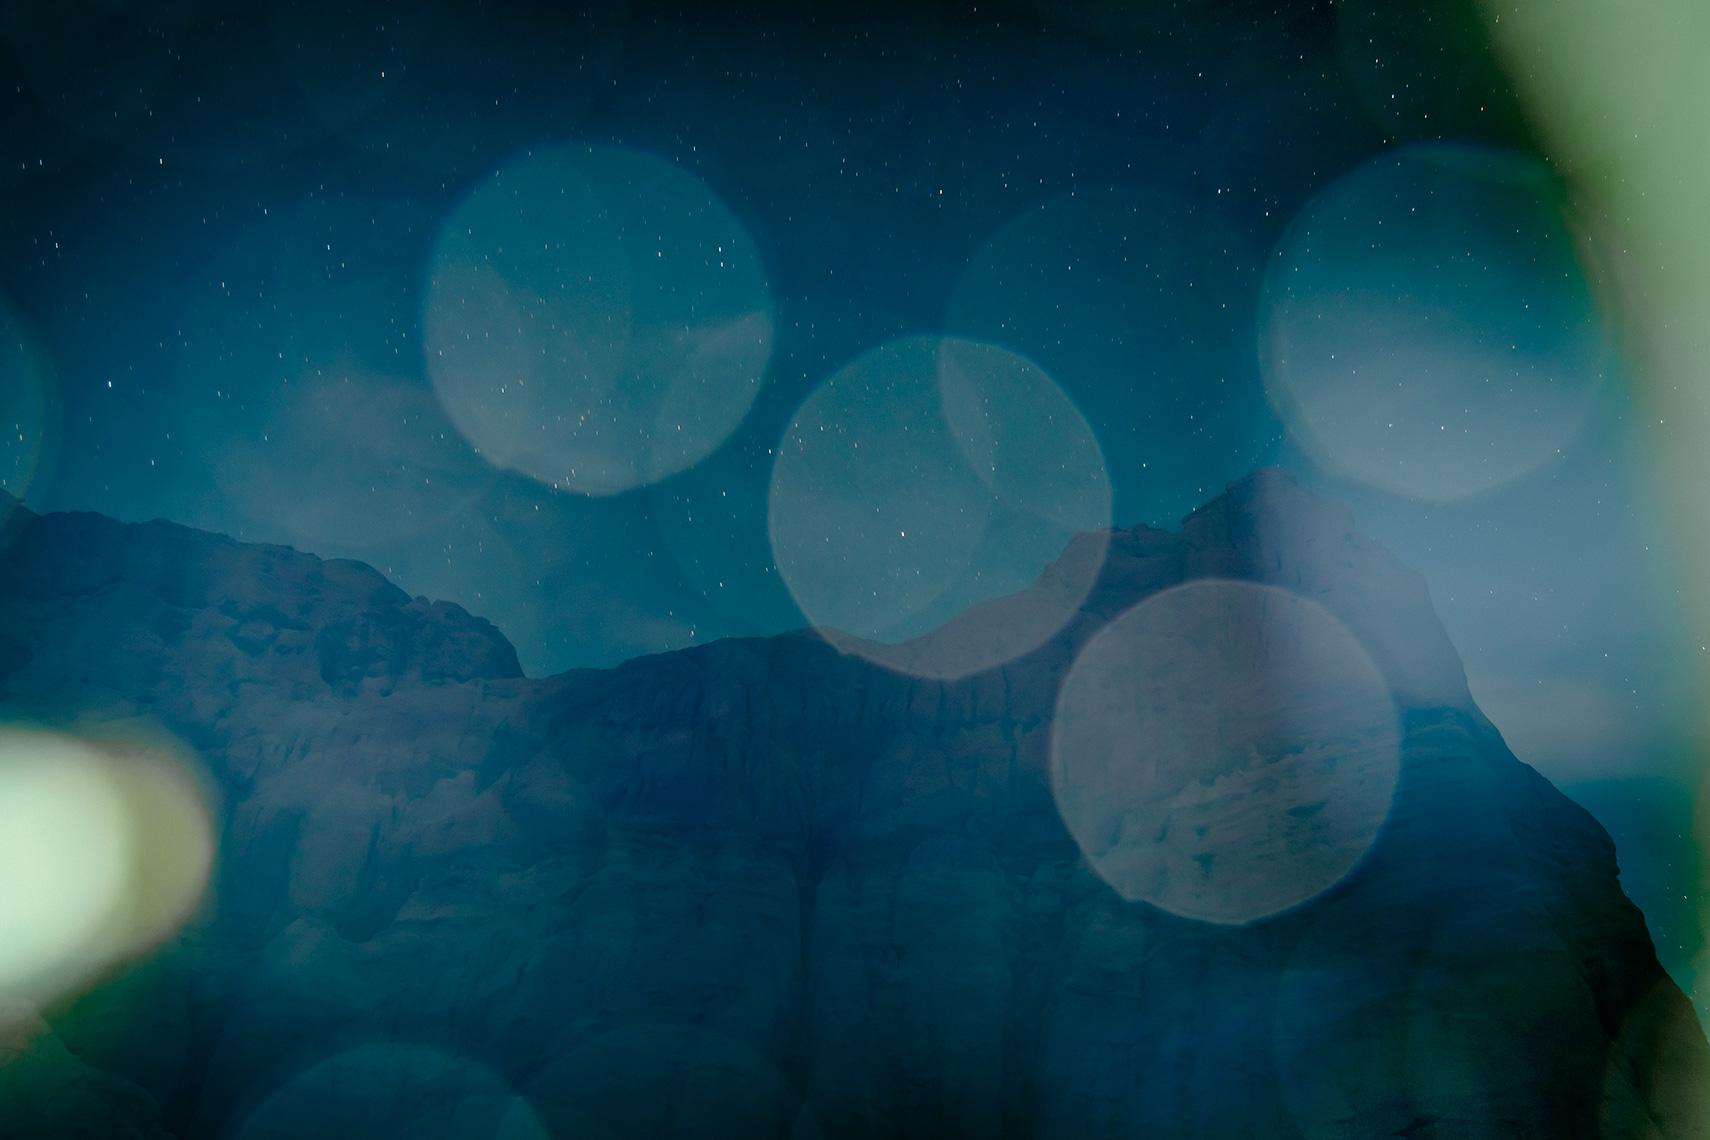 Brian Konoske, Night Rocks, size tbd